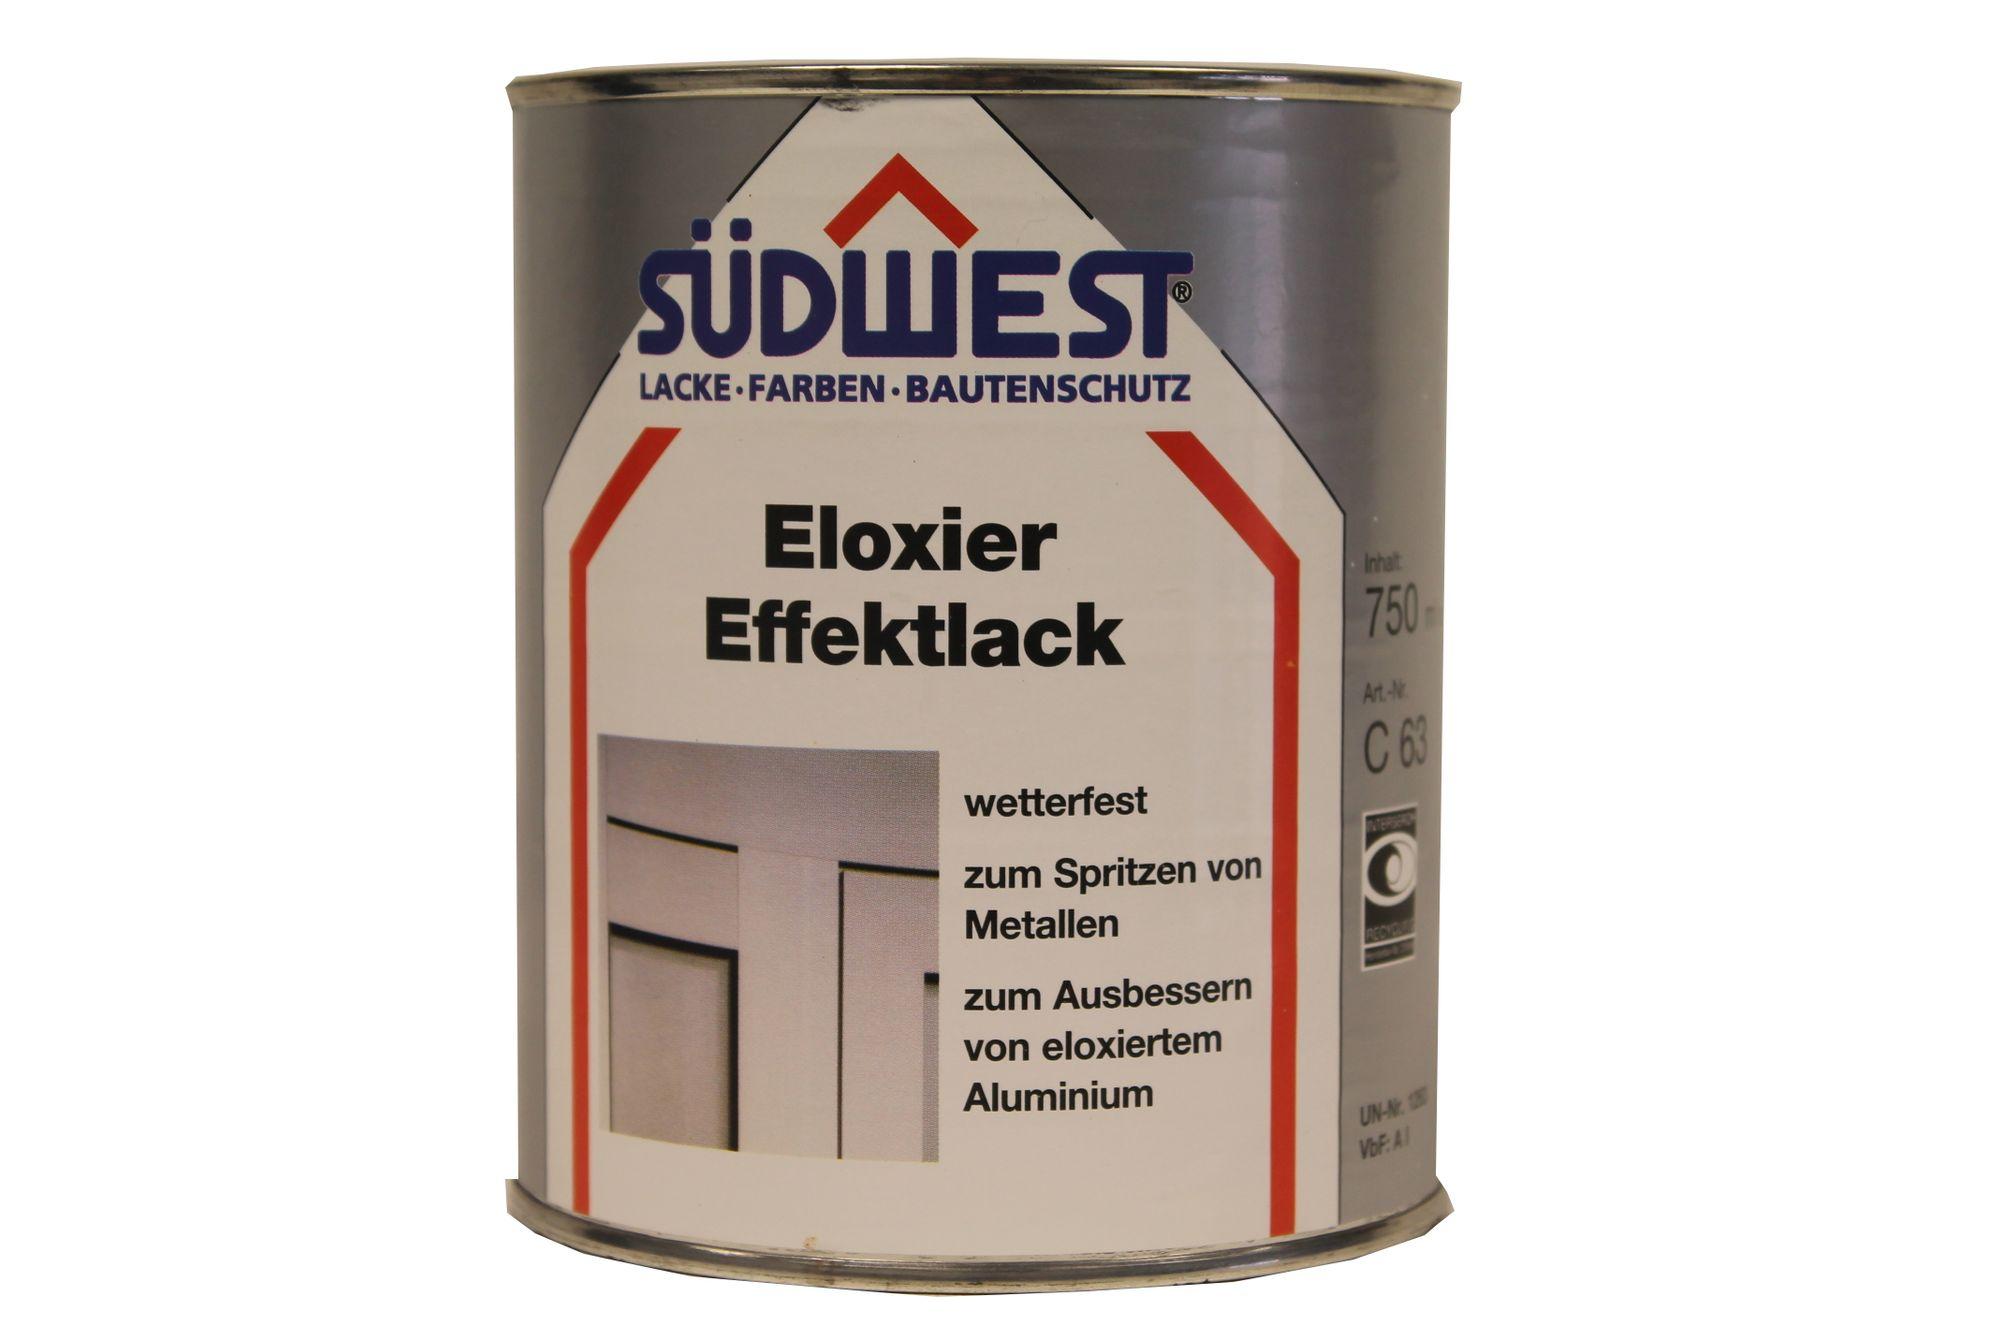 Südwest Eloxier Effektlack C63 seidenglänzend 8620 mittelbraun 0,75 l